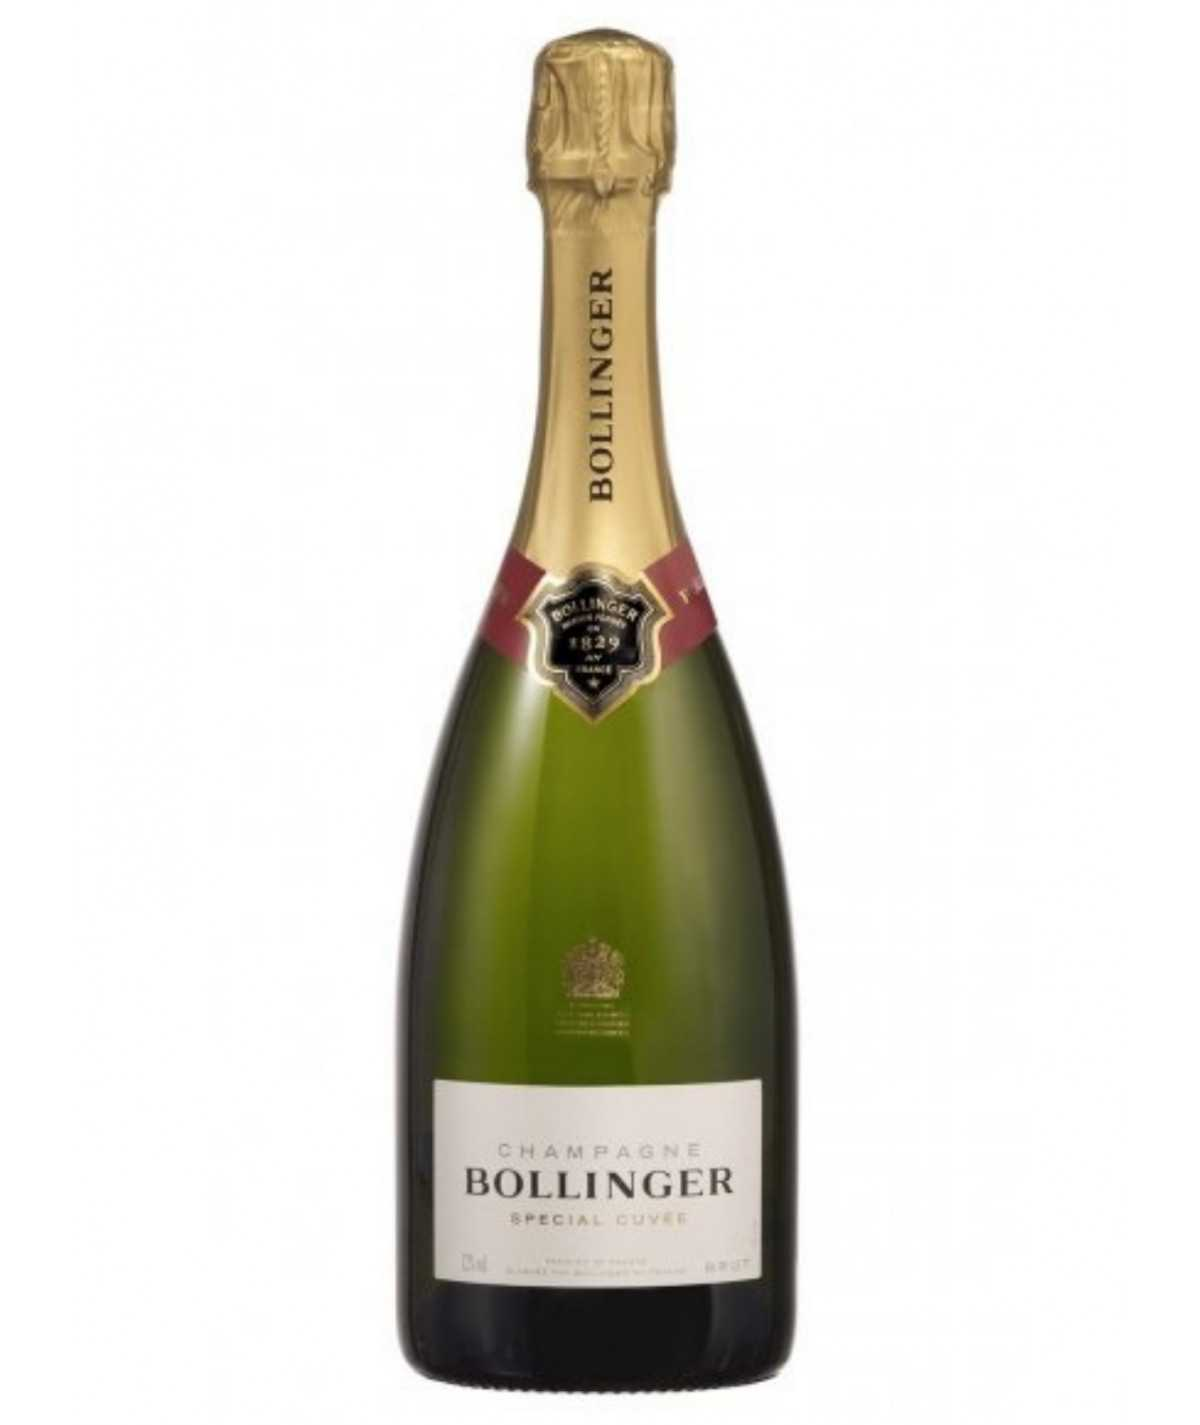 Buy Champagne BOLLINGER Spécial Cuve